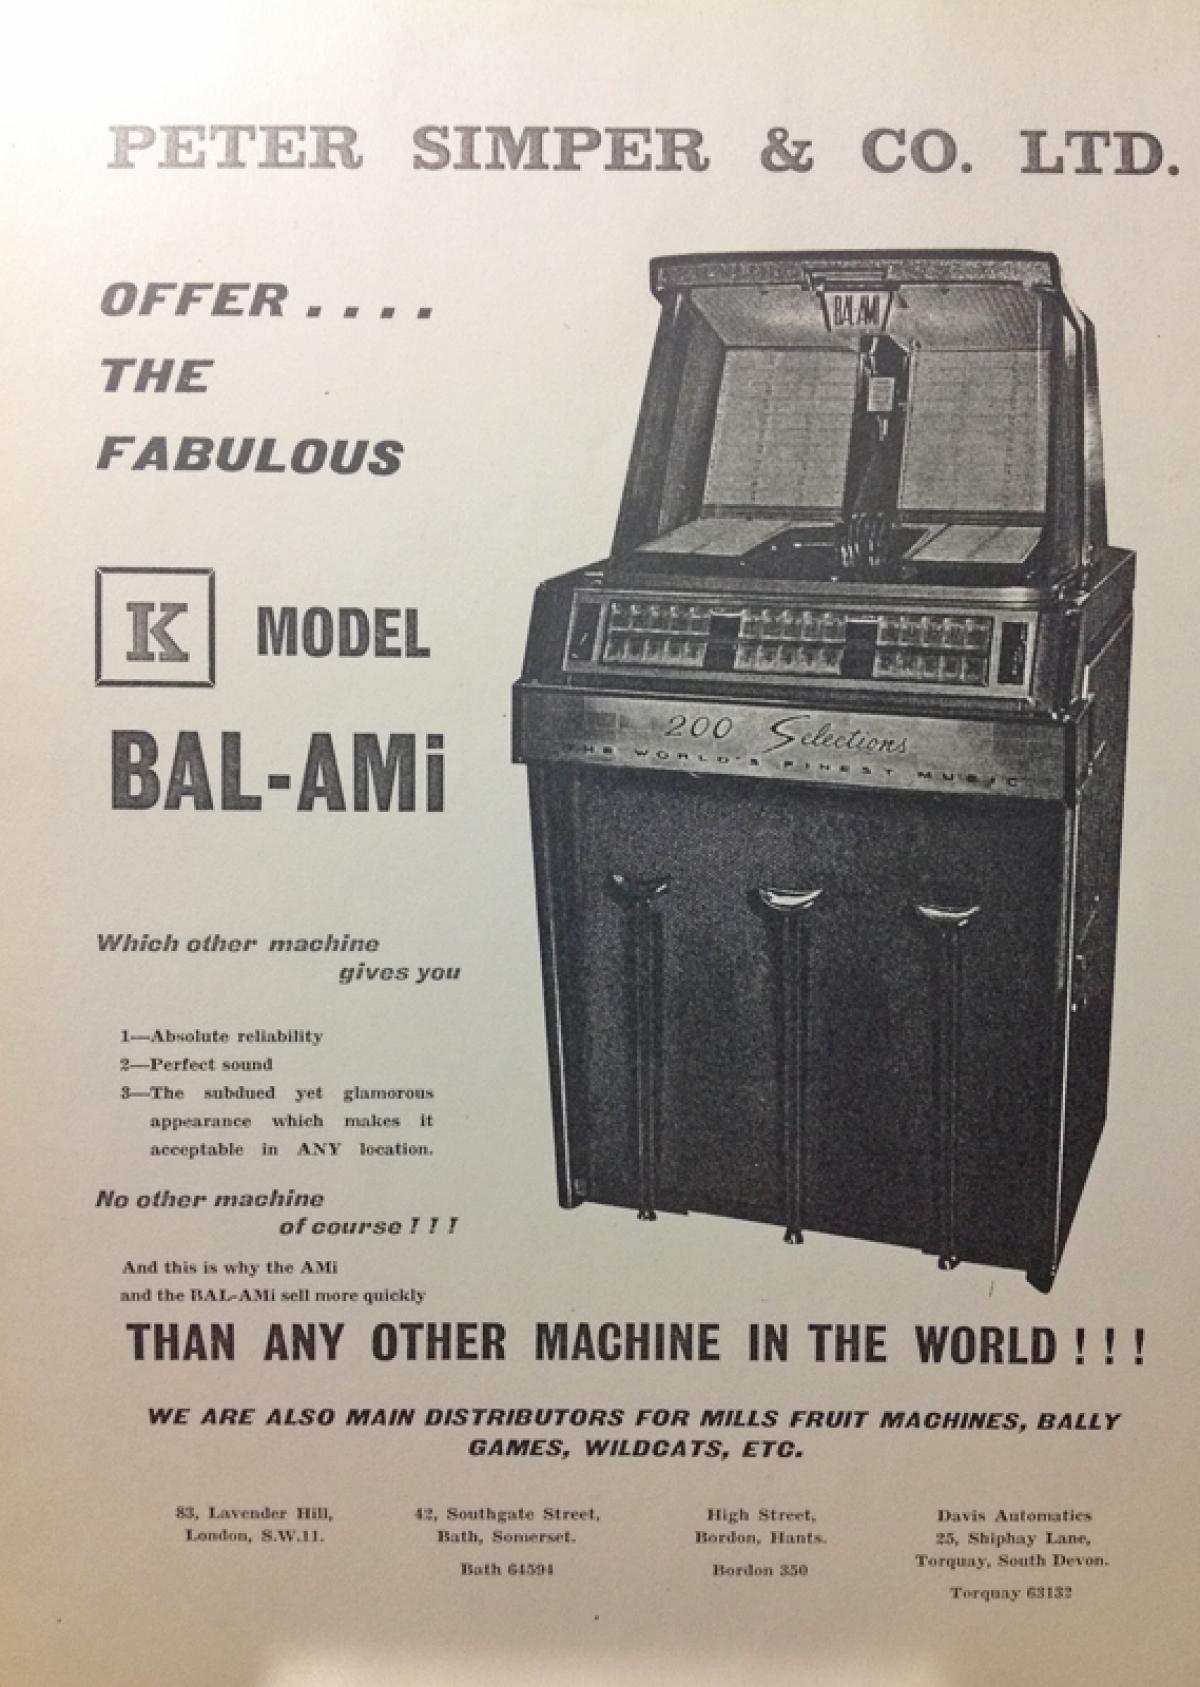 The Fabulous Model K